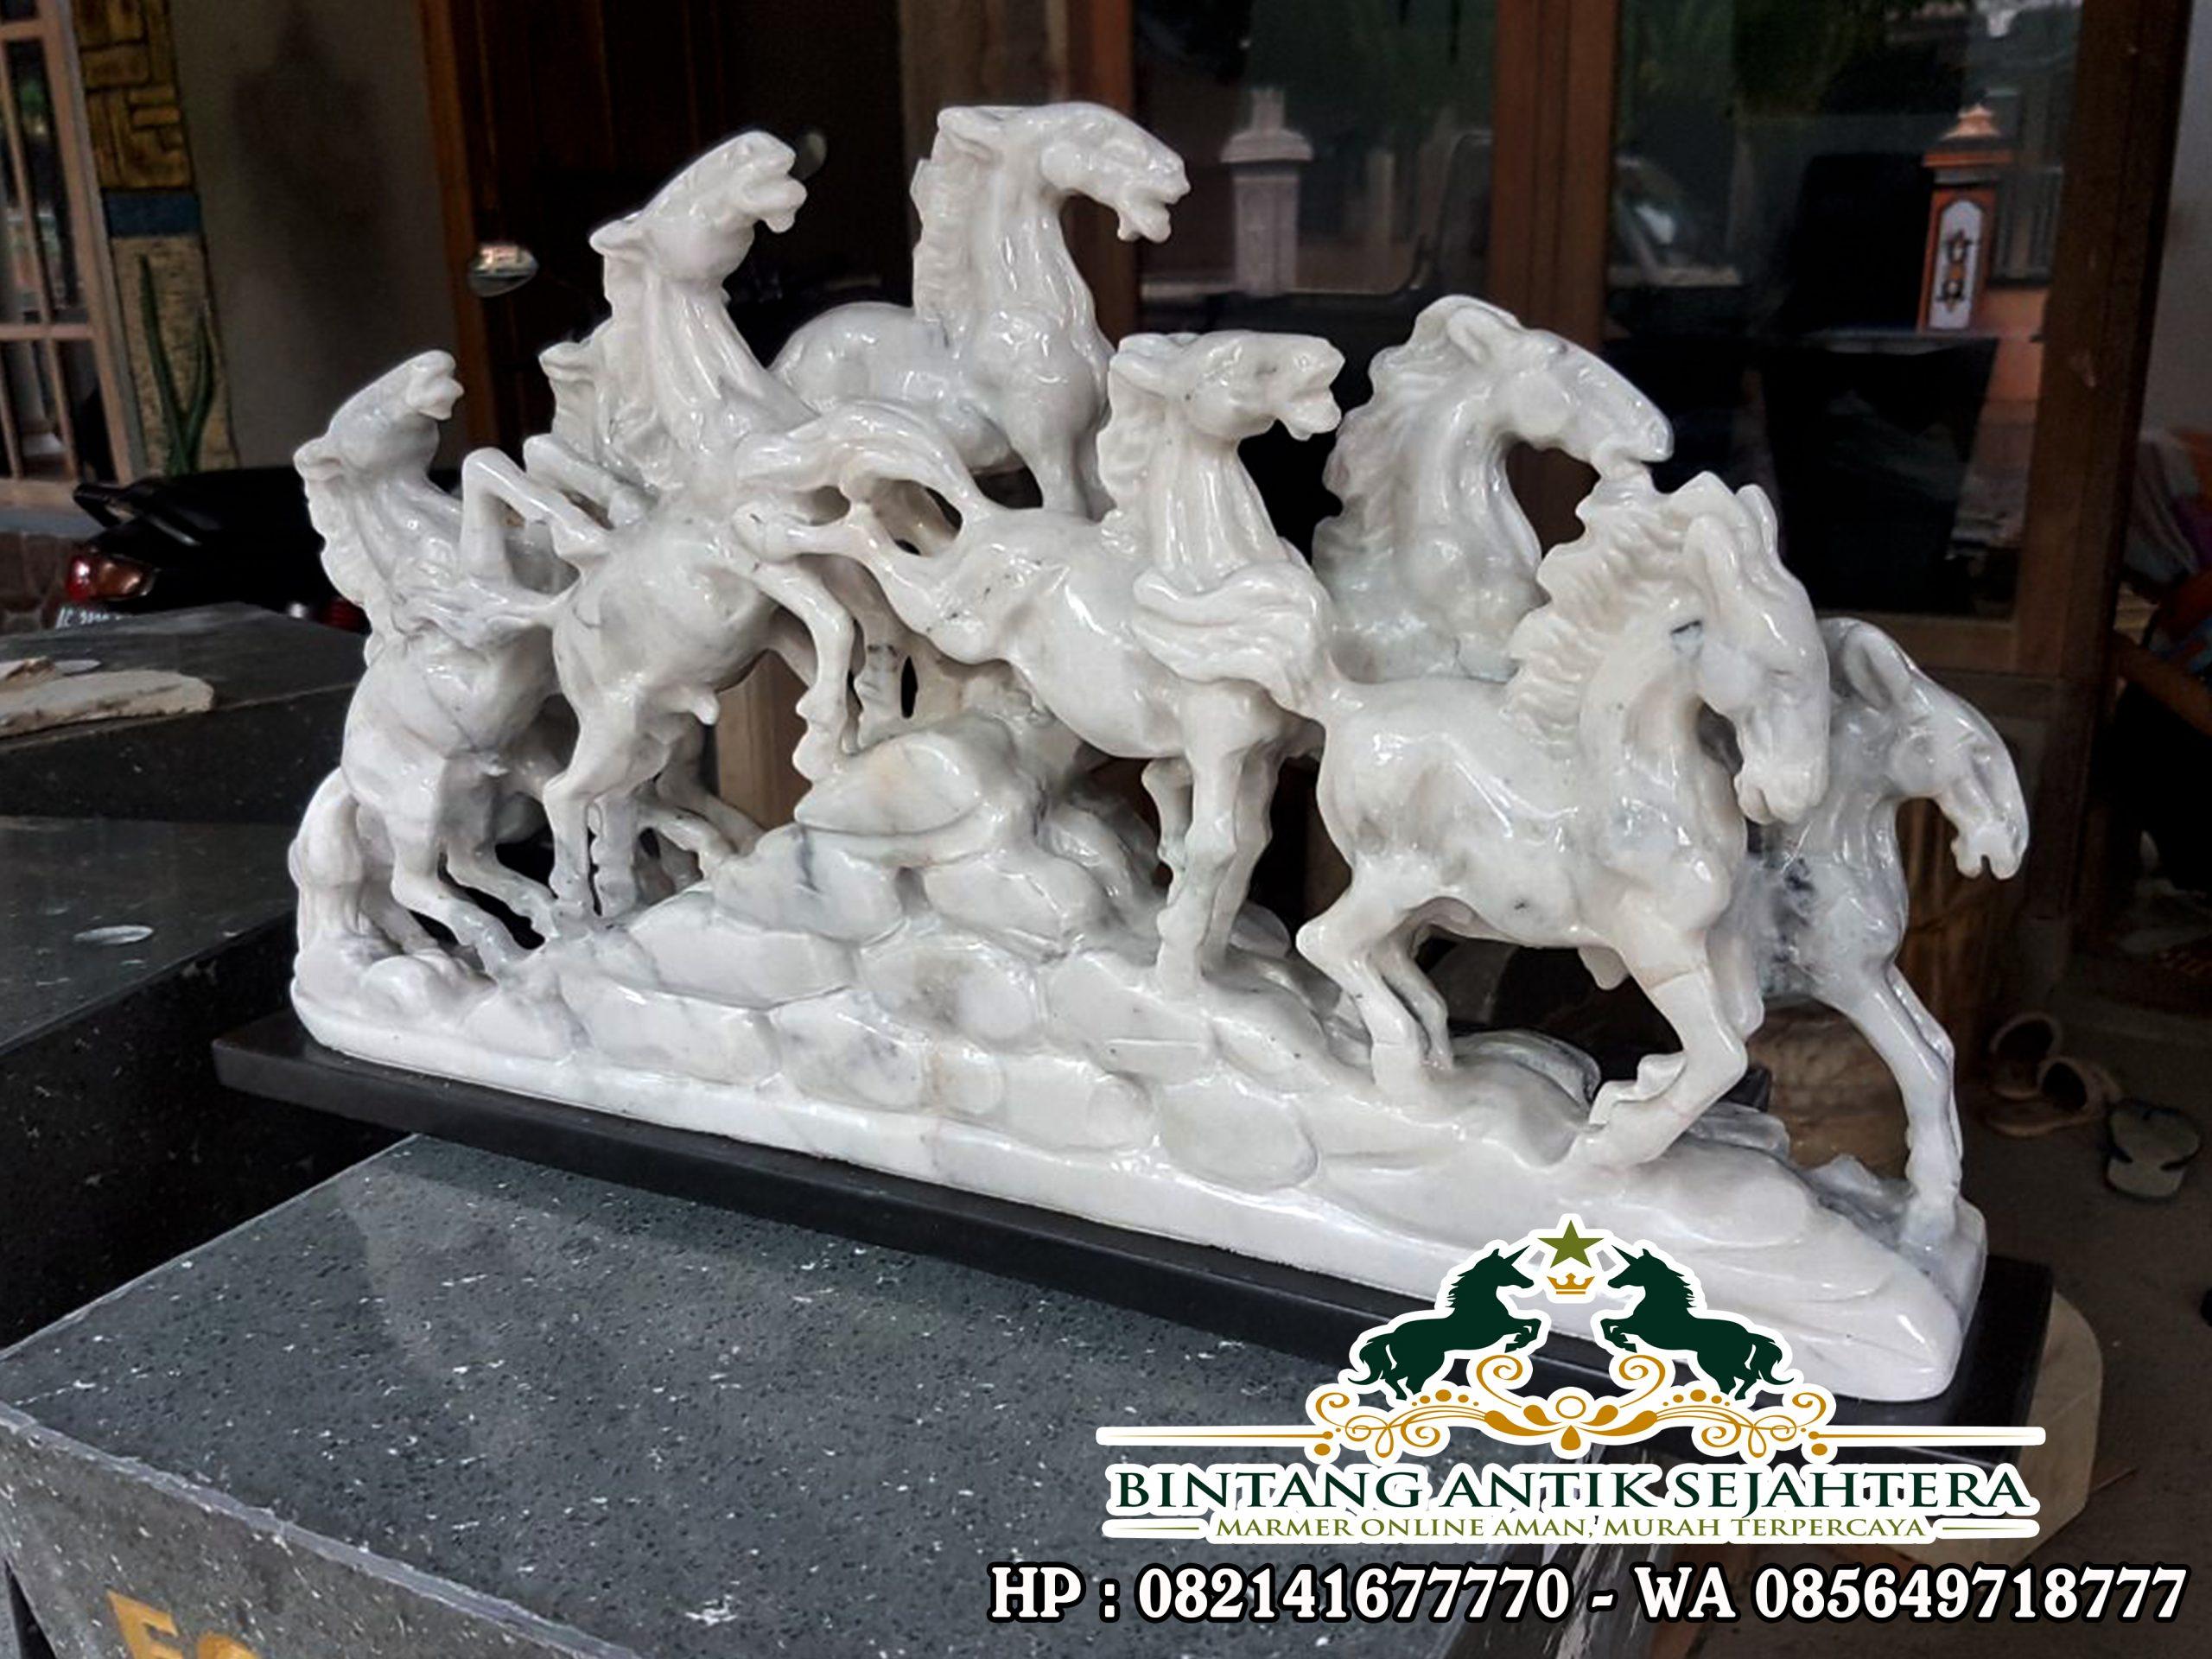 Jual Patung Kuda Putih | Patung Kuda Batu Marmer